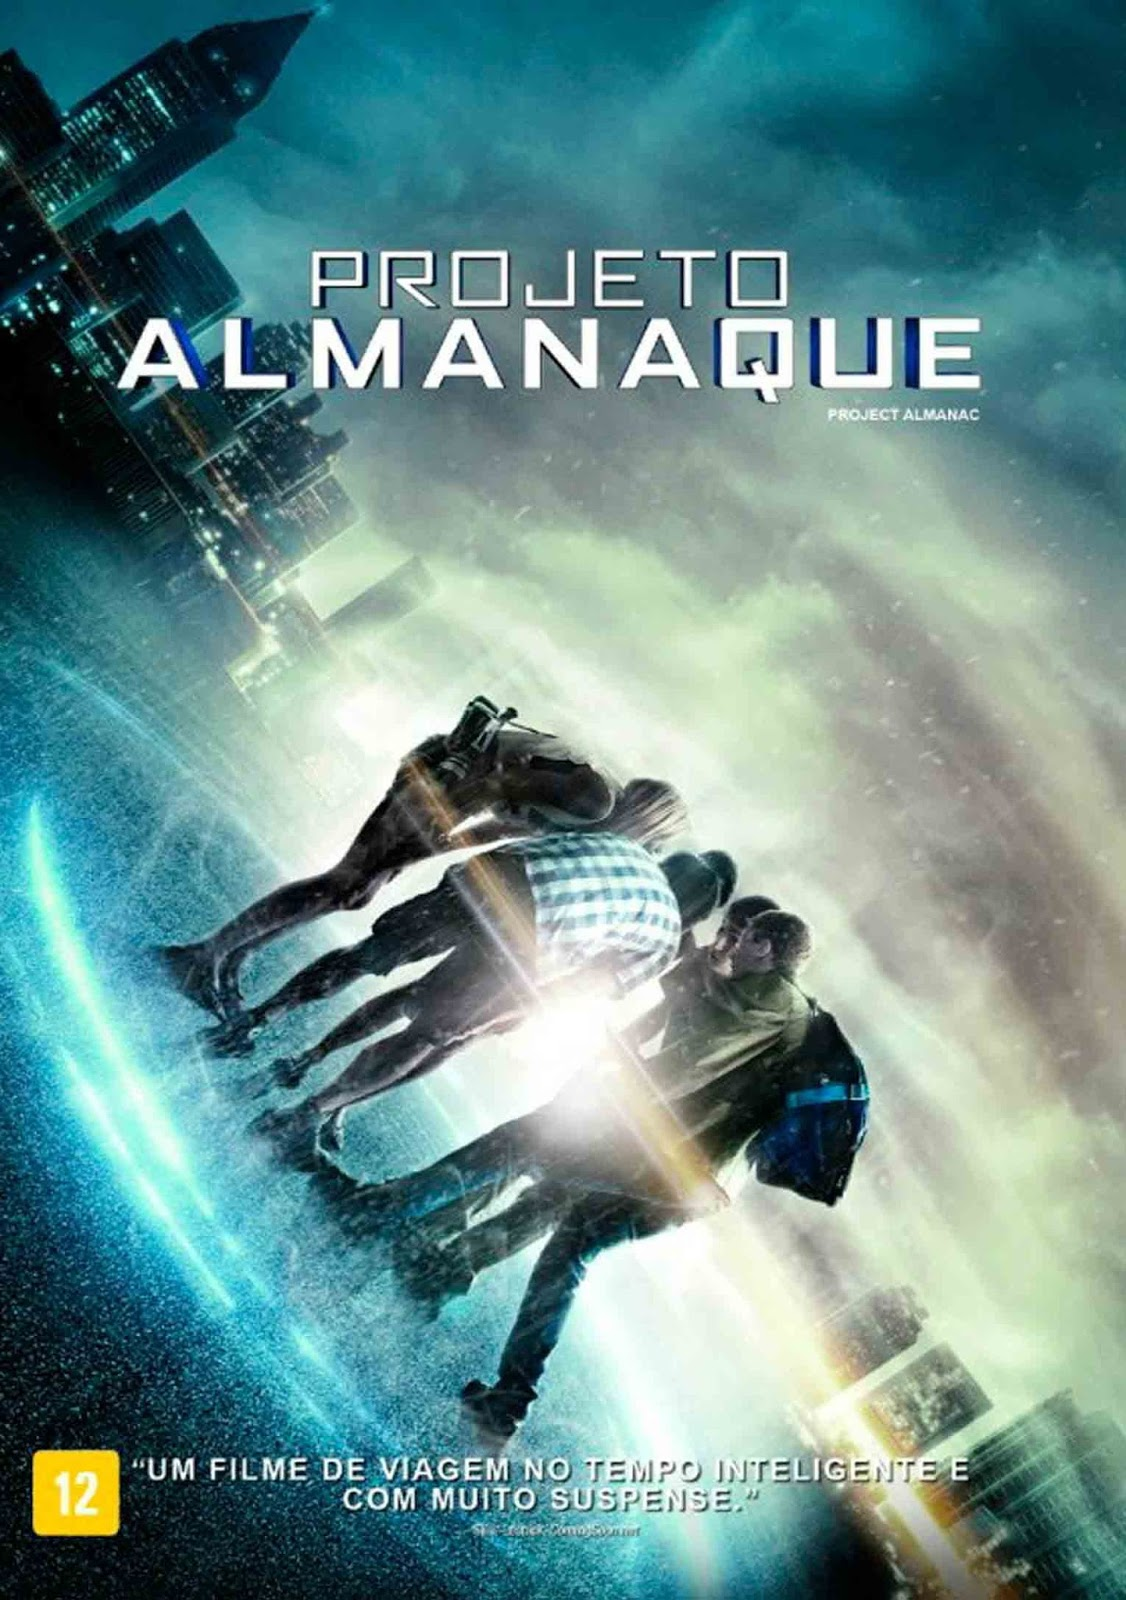 Projeto Almanaque Torrent – Blu-ray Rip 1080p Dual Áudio (2015)